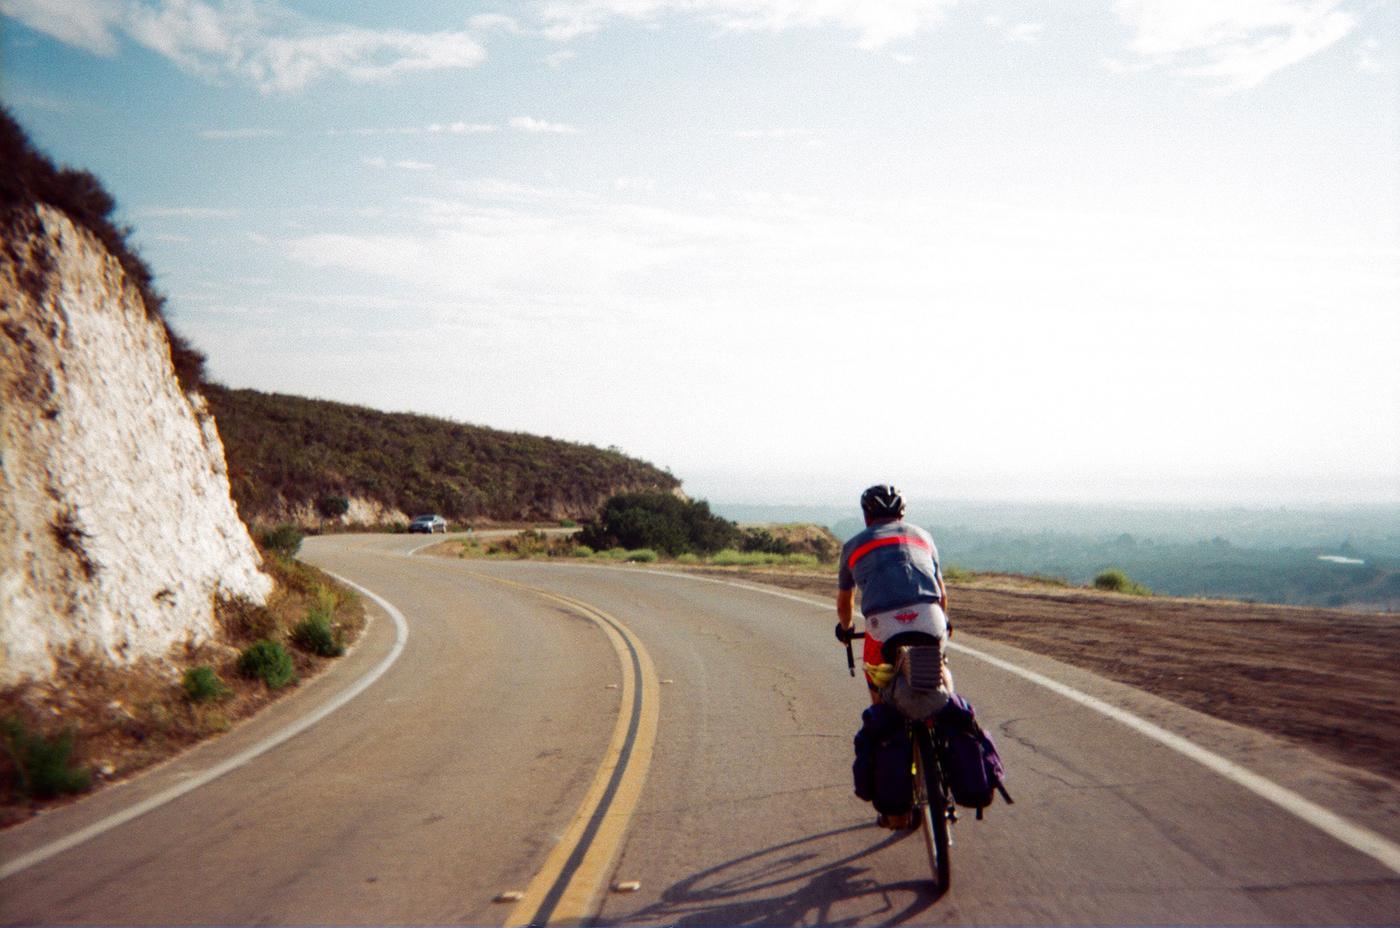 Time Moves Slow: San Francisco to San Diego